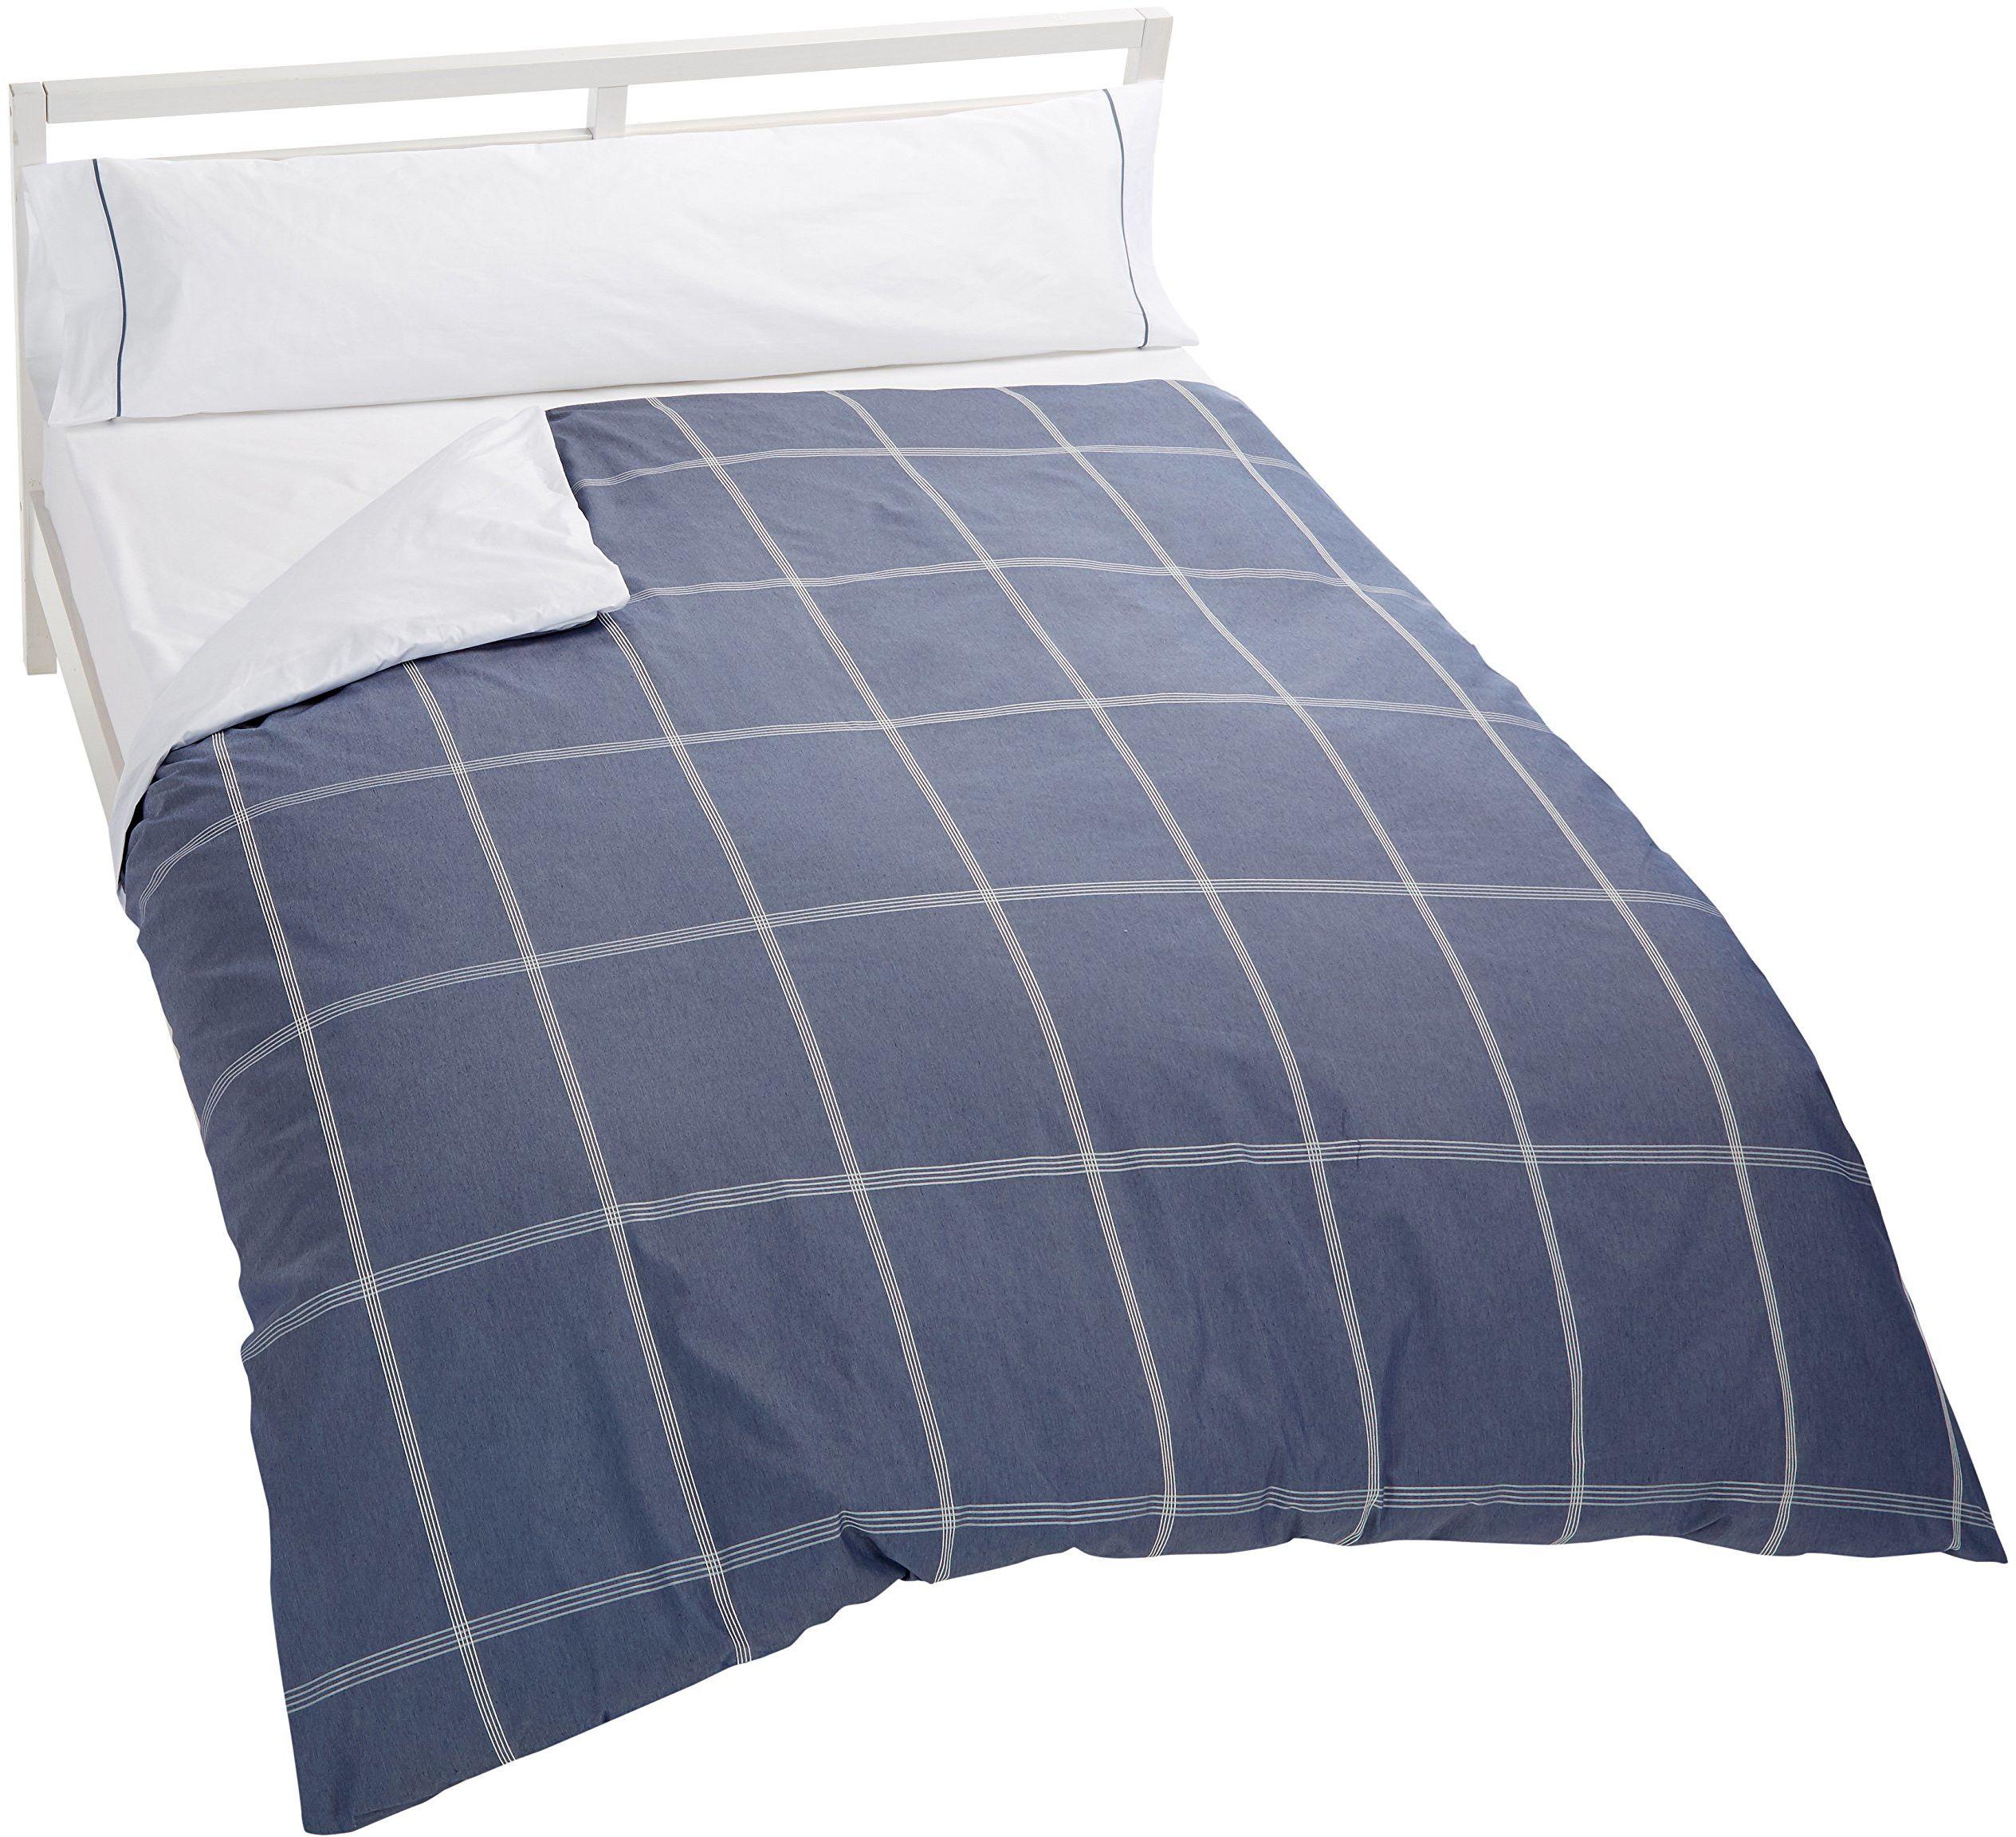 Artemur Rubin  podwójna kołdra do łóżka 135 cm niebieska